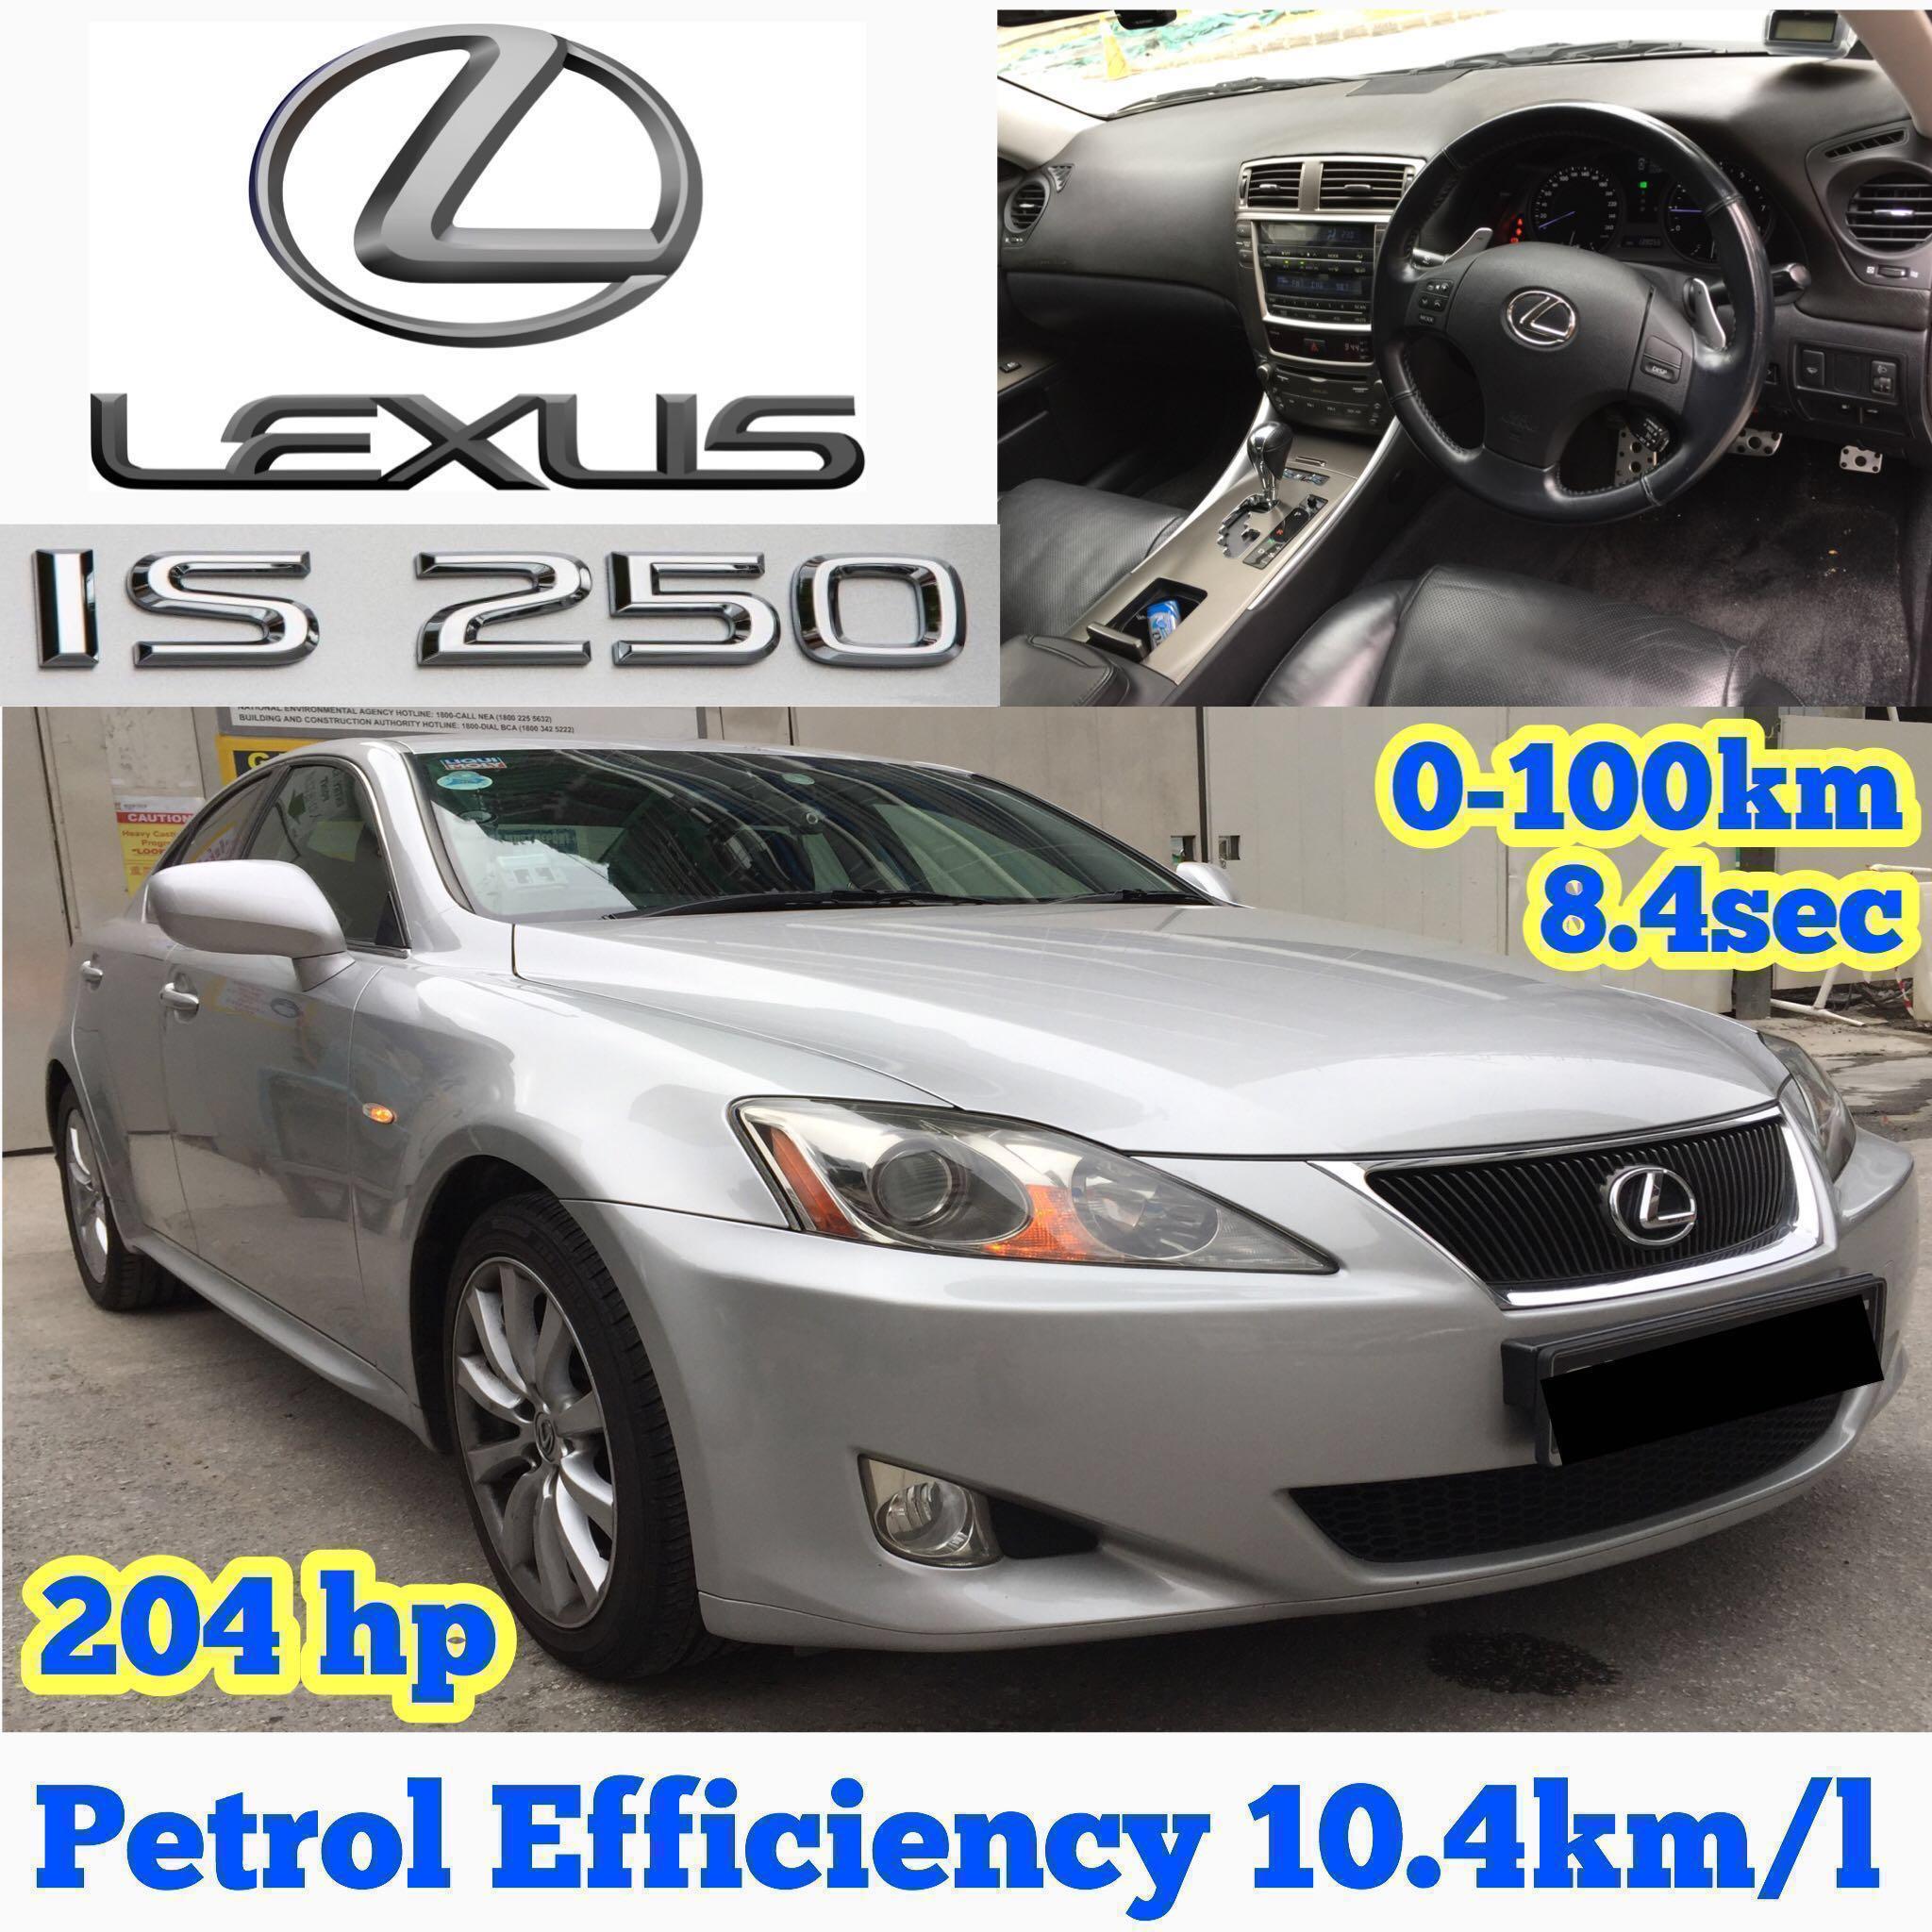 ✨Lexus IS250($59) ✨Estima MPV($69) ✨Vezel Hybrid($69) ✨Honda Accord($55) ✨ Lexus Super Luxury GS300(i$75) ✨BMW 120i Convertible Cabriolet ($76) ✨BMW  ...